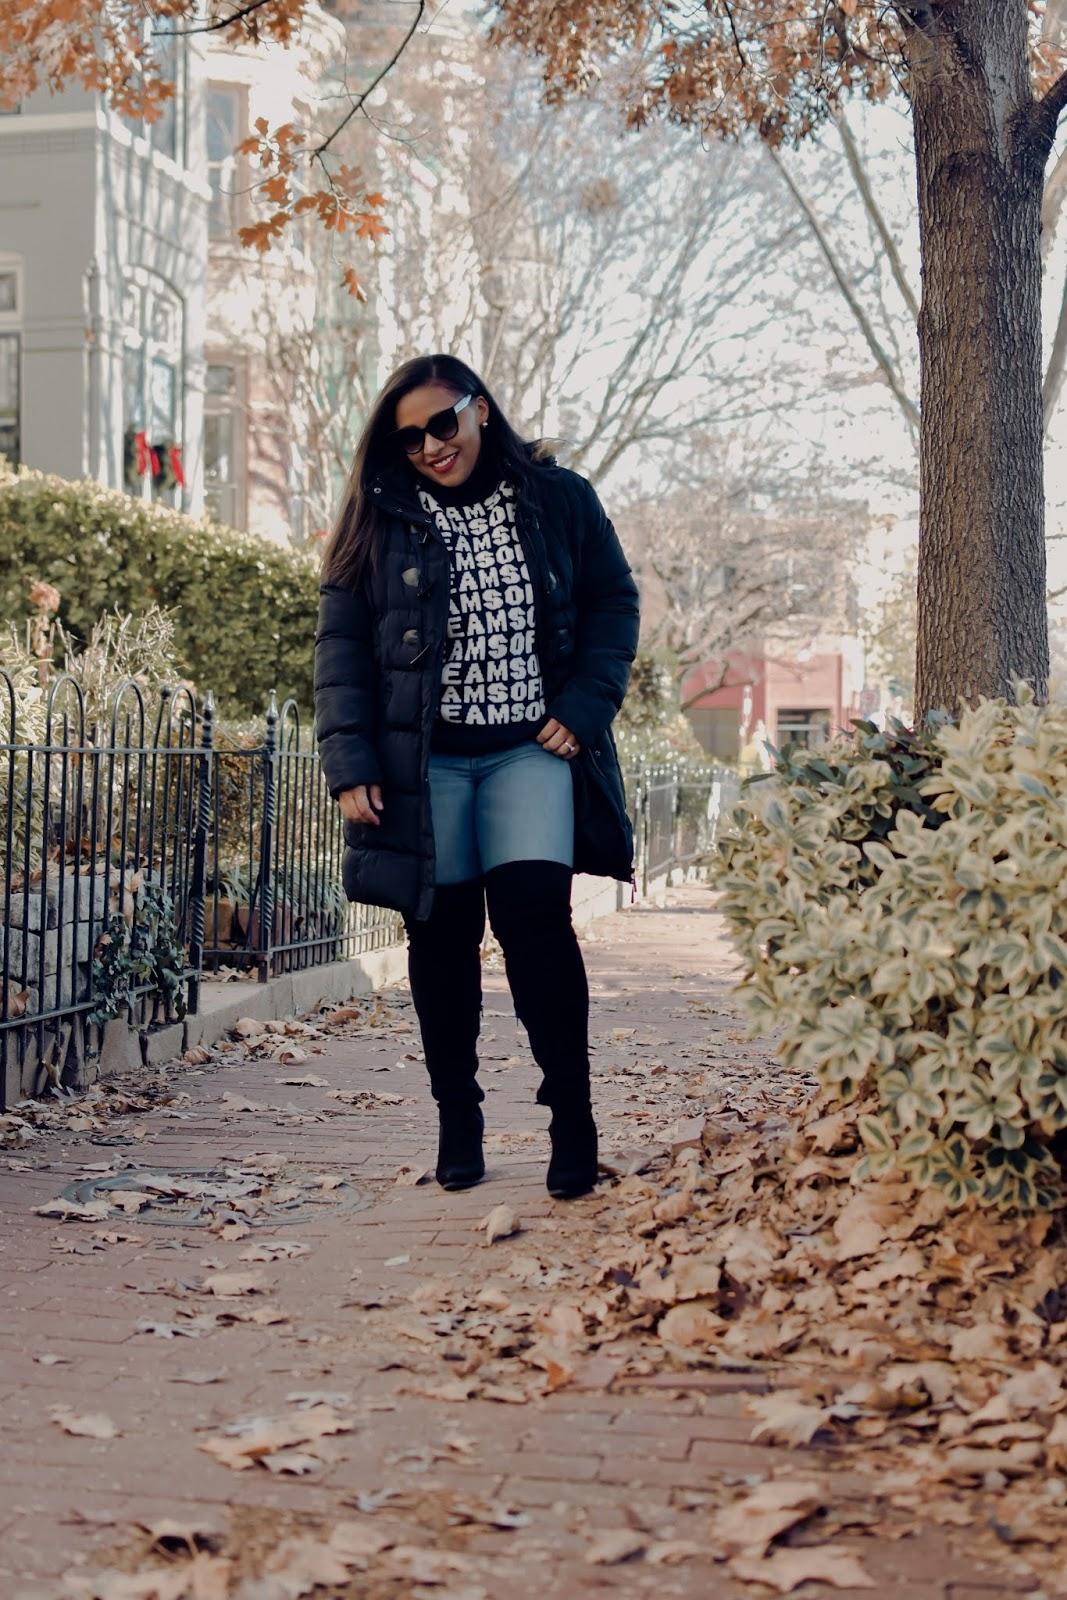 pattys kloset, winter coat, winter accessories, over the knee boots, otk boots